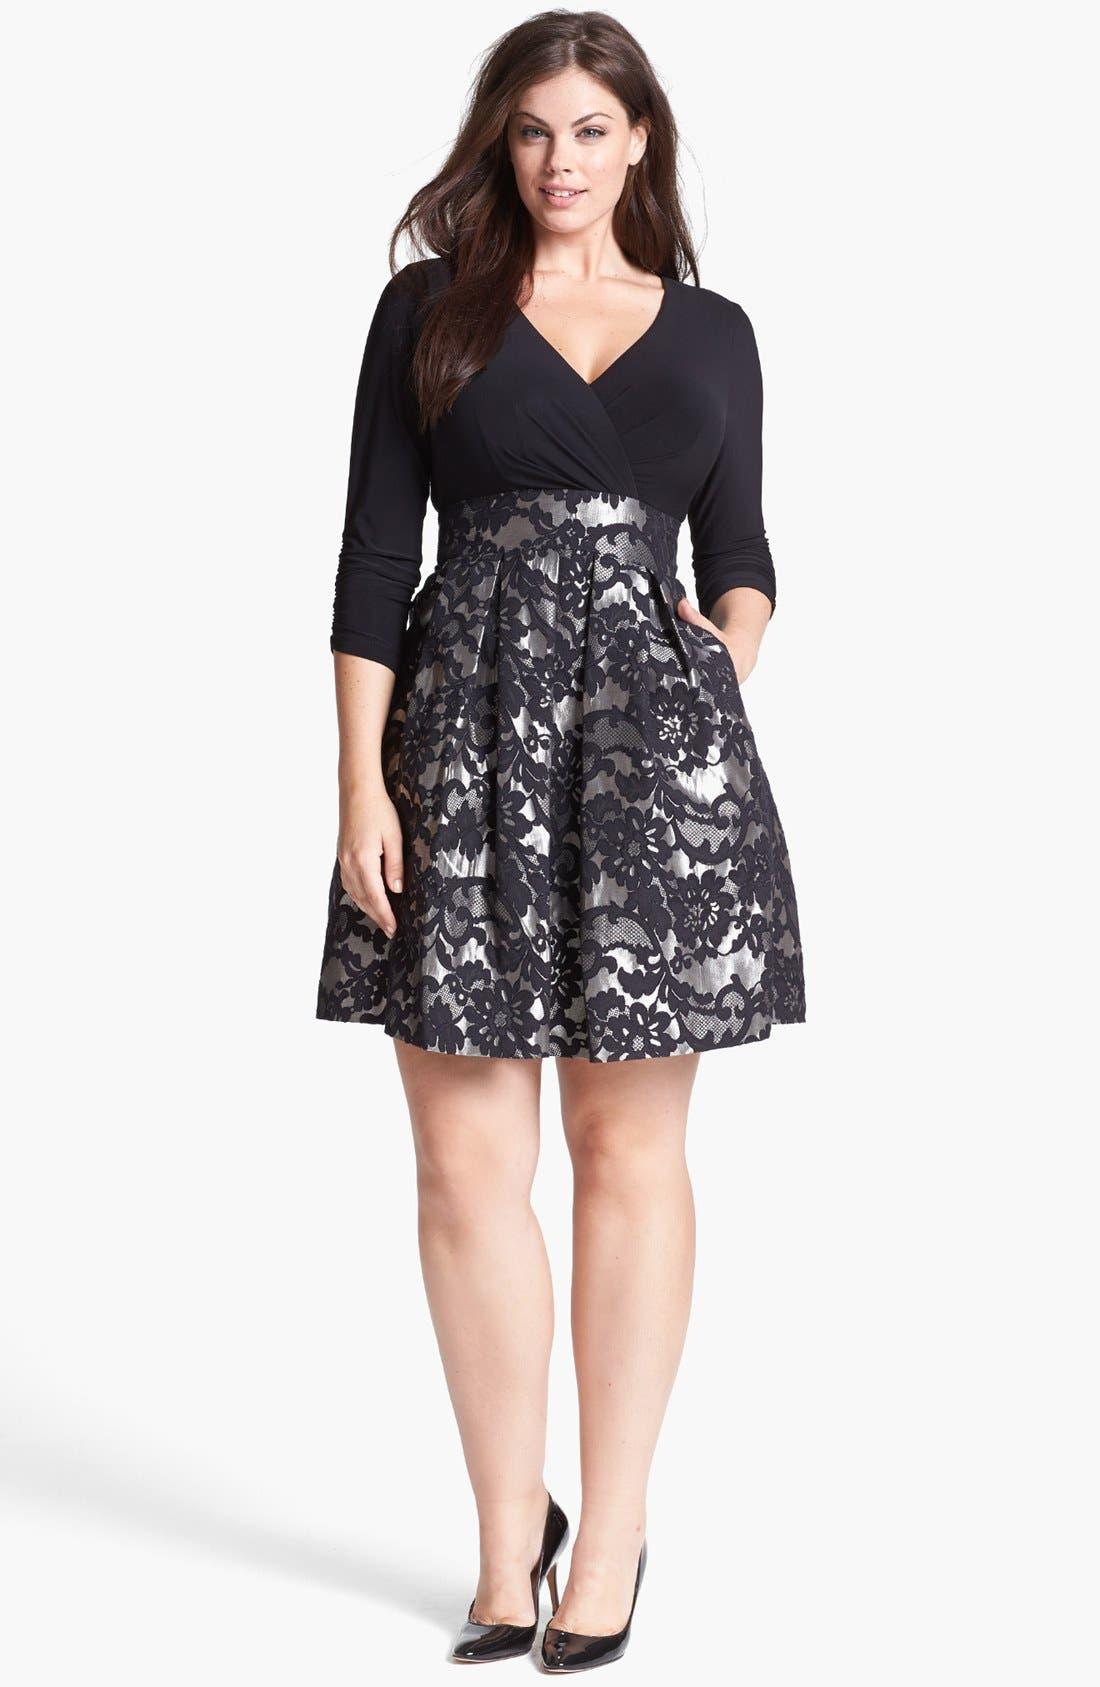 Alternate Image 1 Selected - Eliza J Jacquard Skirt Dress (Plus Size)